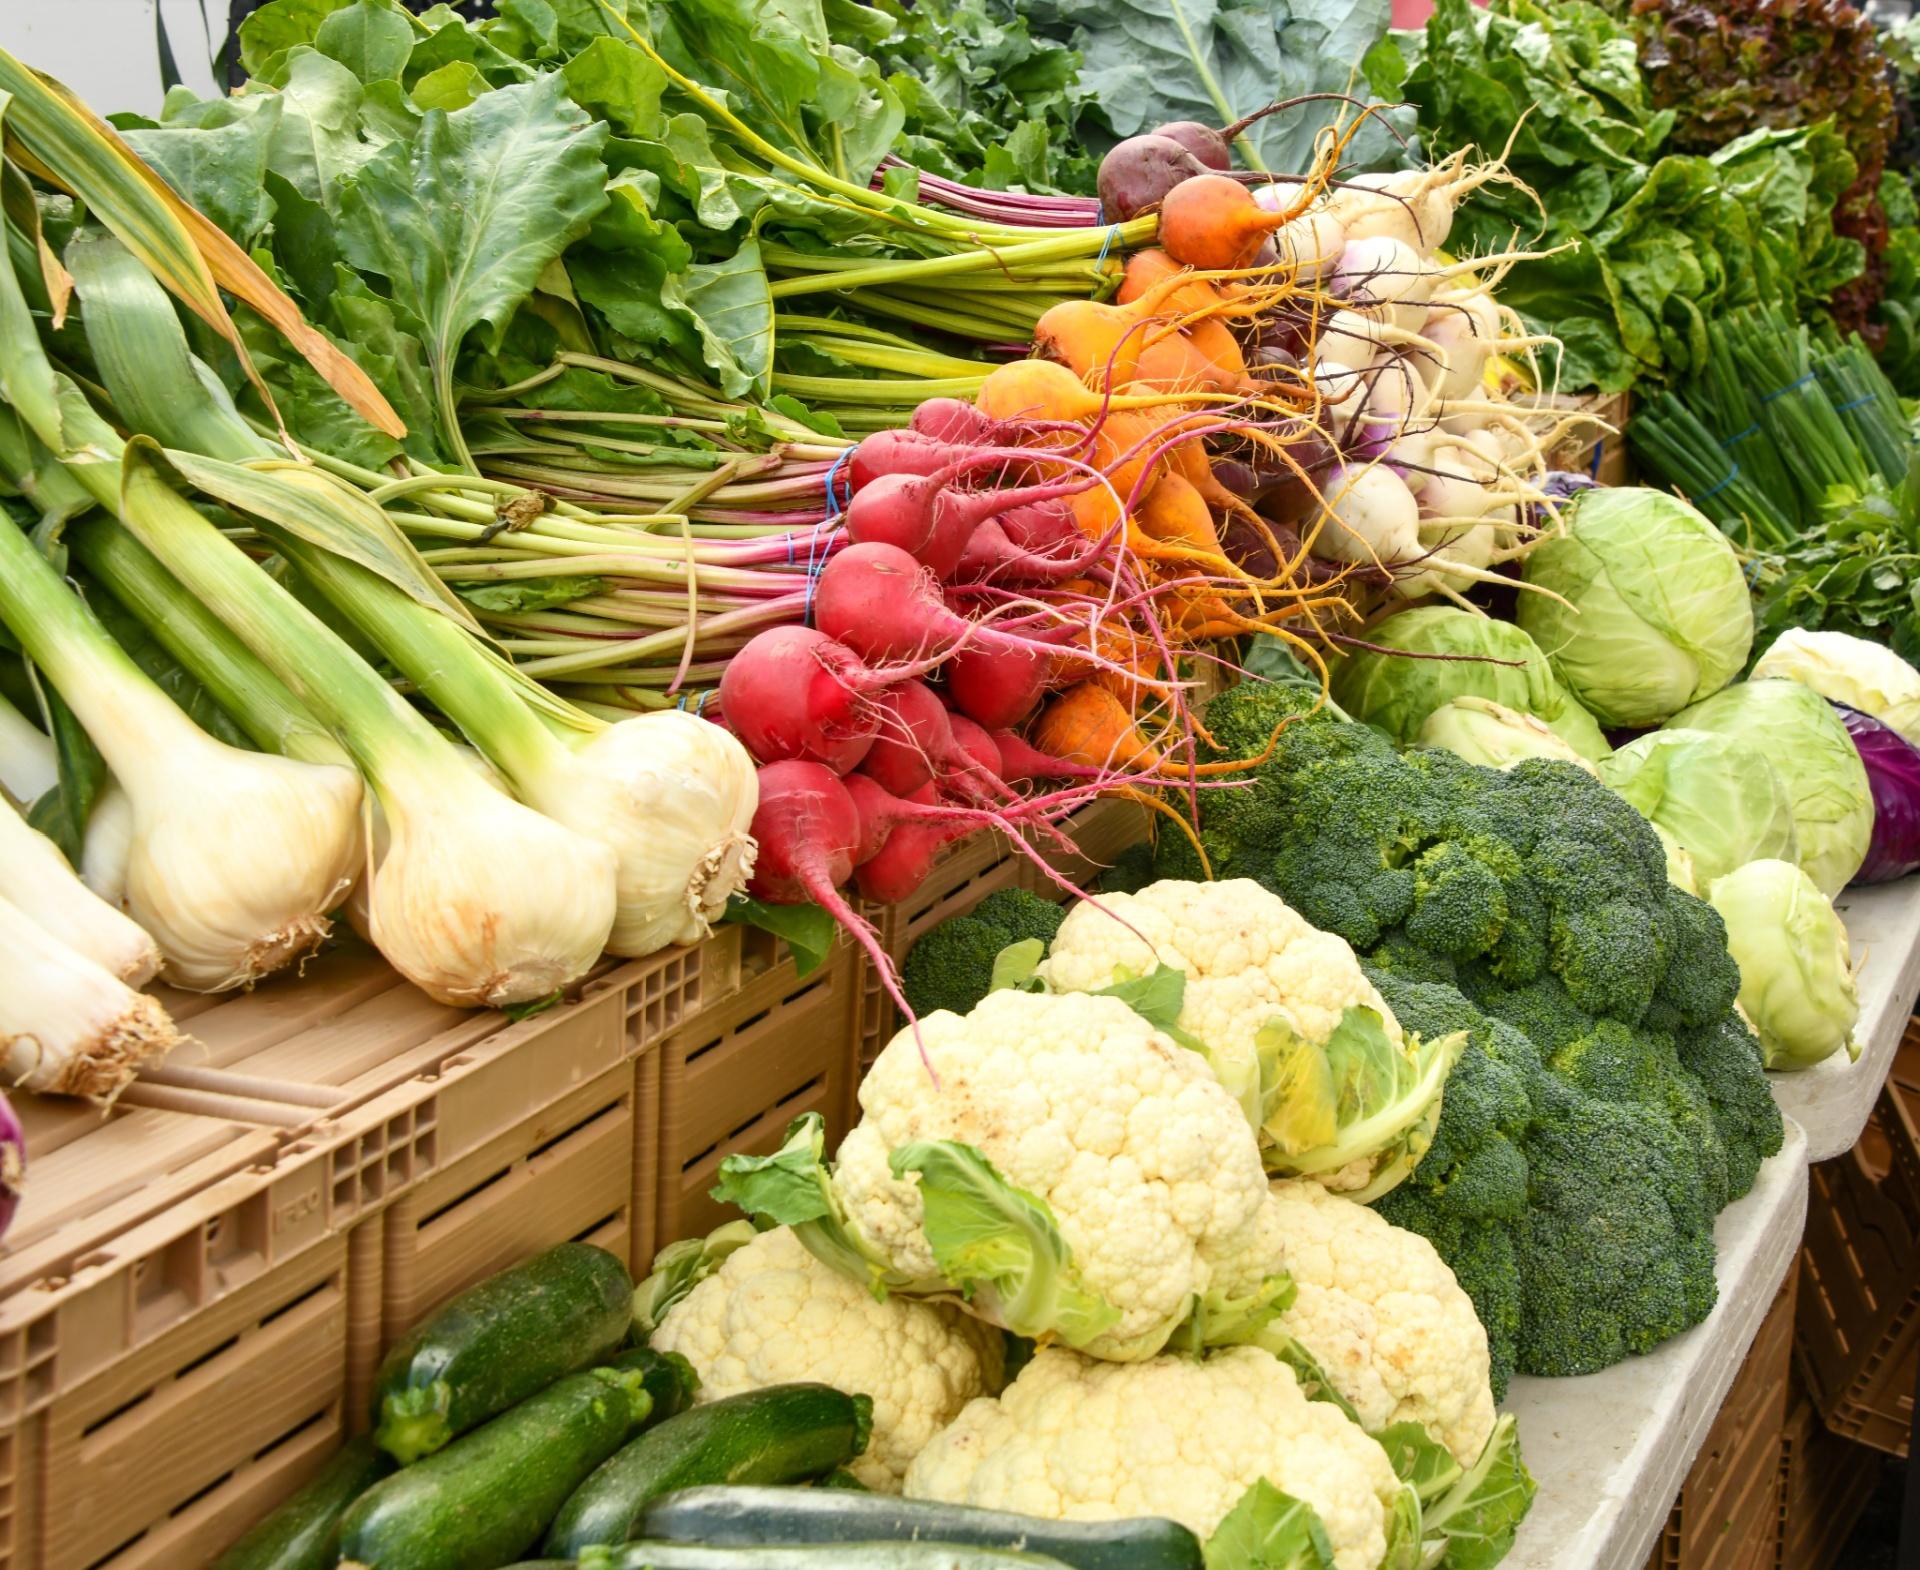 Best Tips For Storing Fresh Fruit and Vegetables